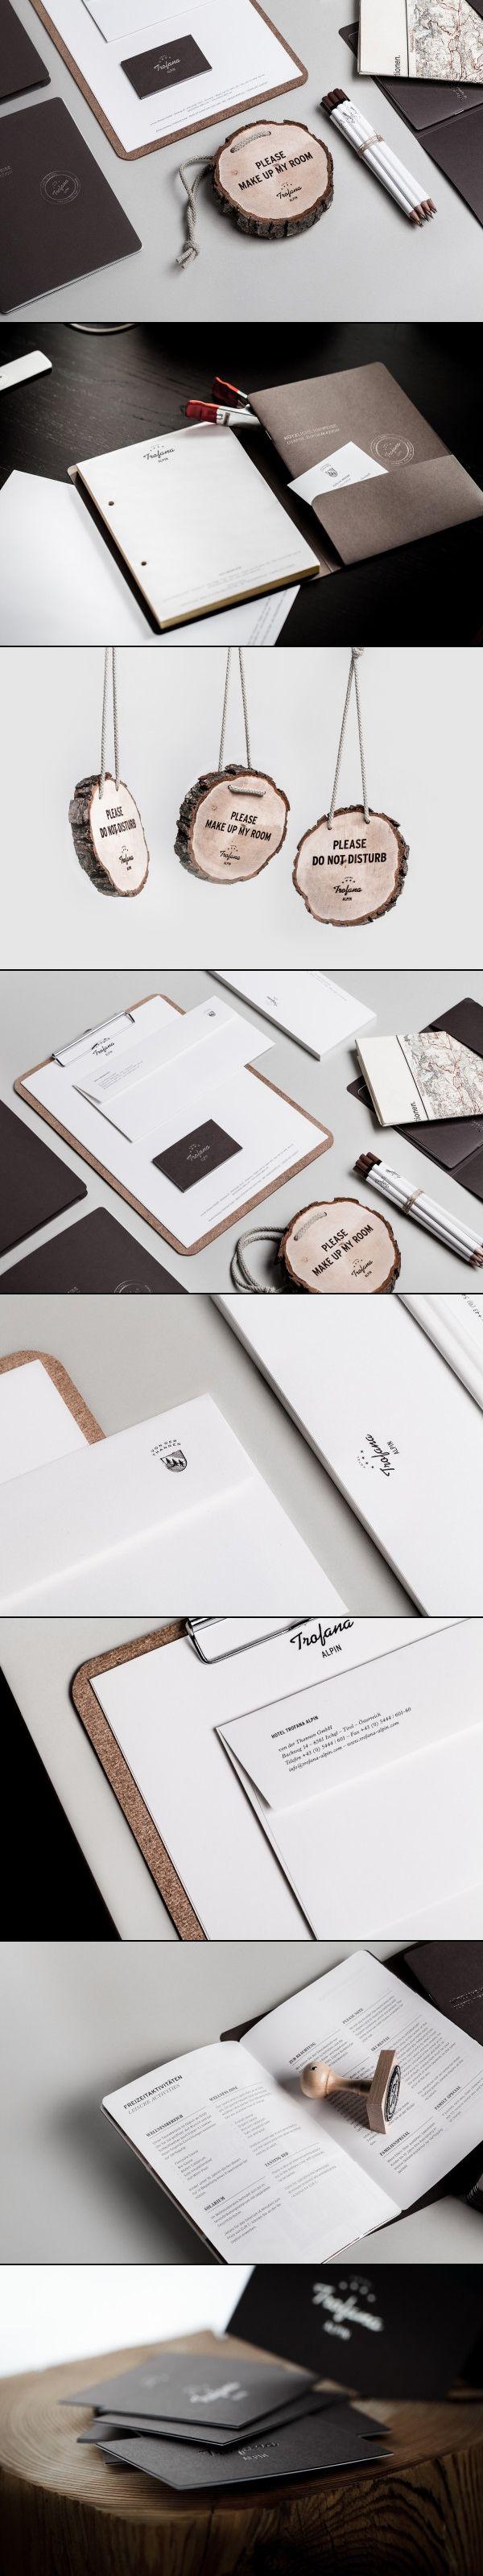 Hotel Trofana Alpin Corporate Identity via Design made in Germany.